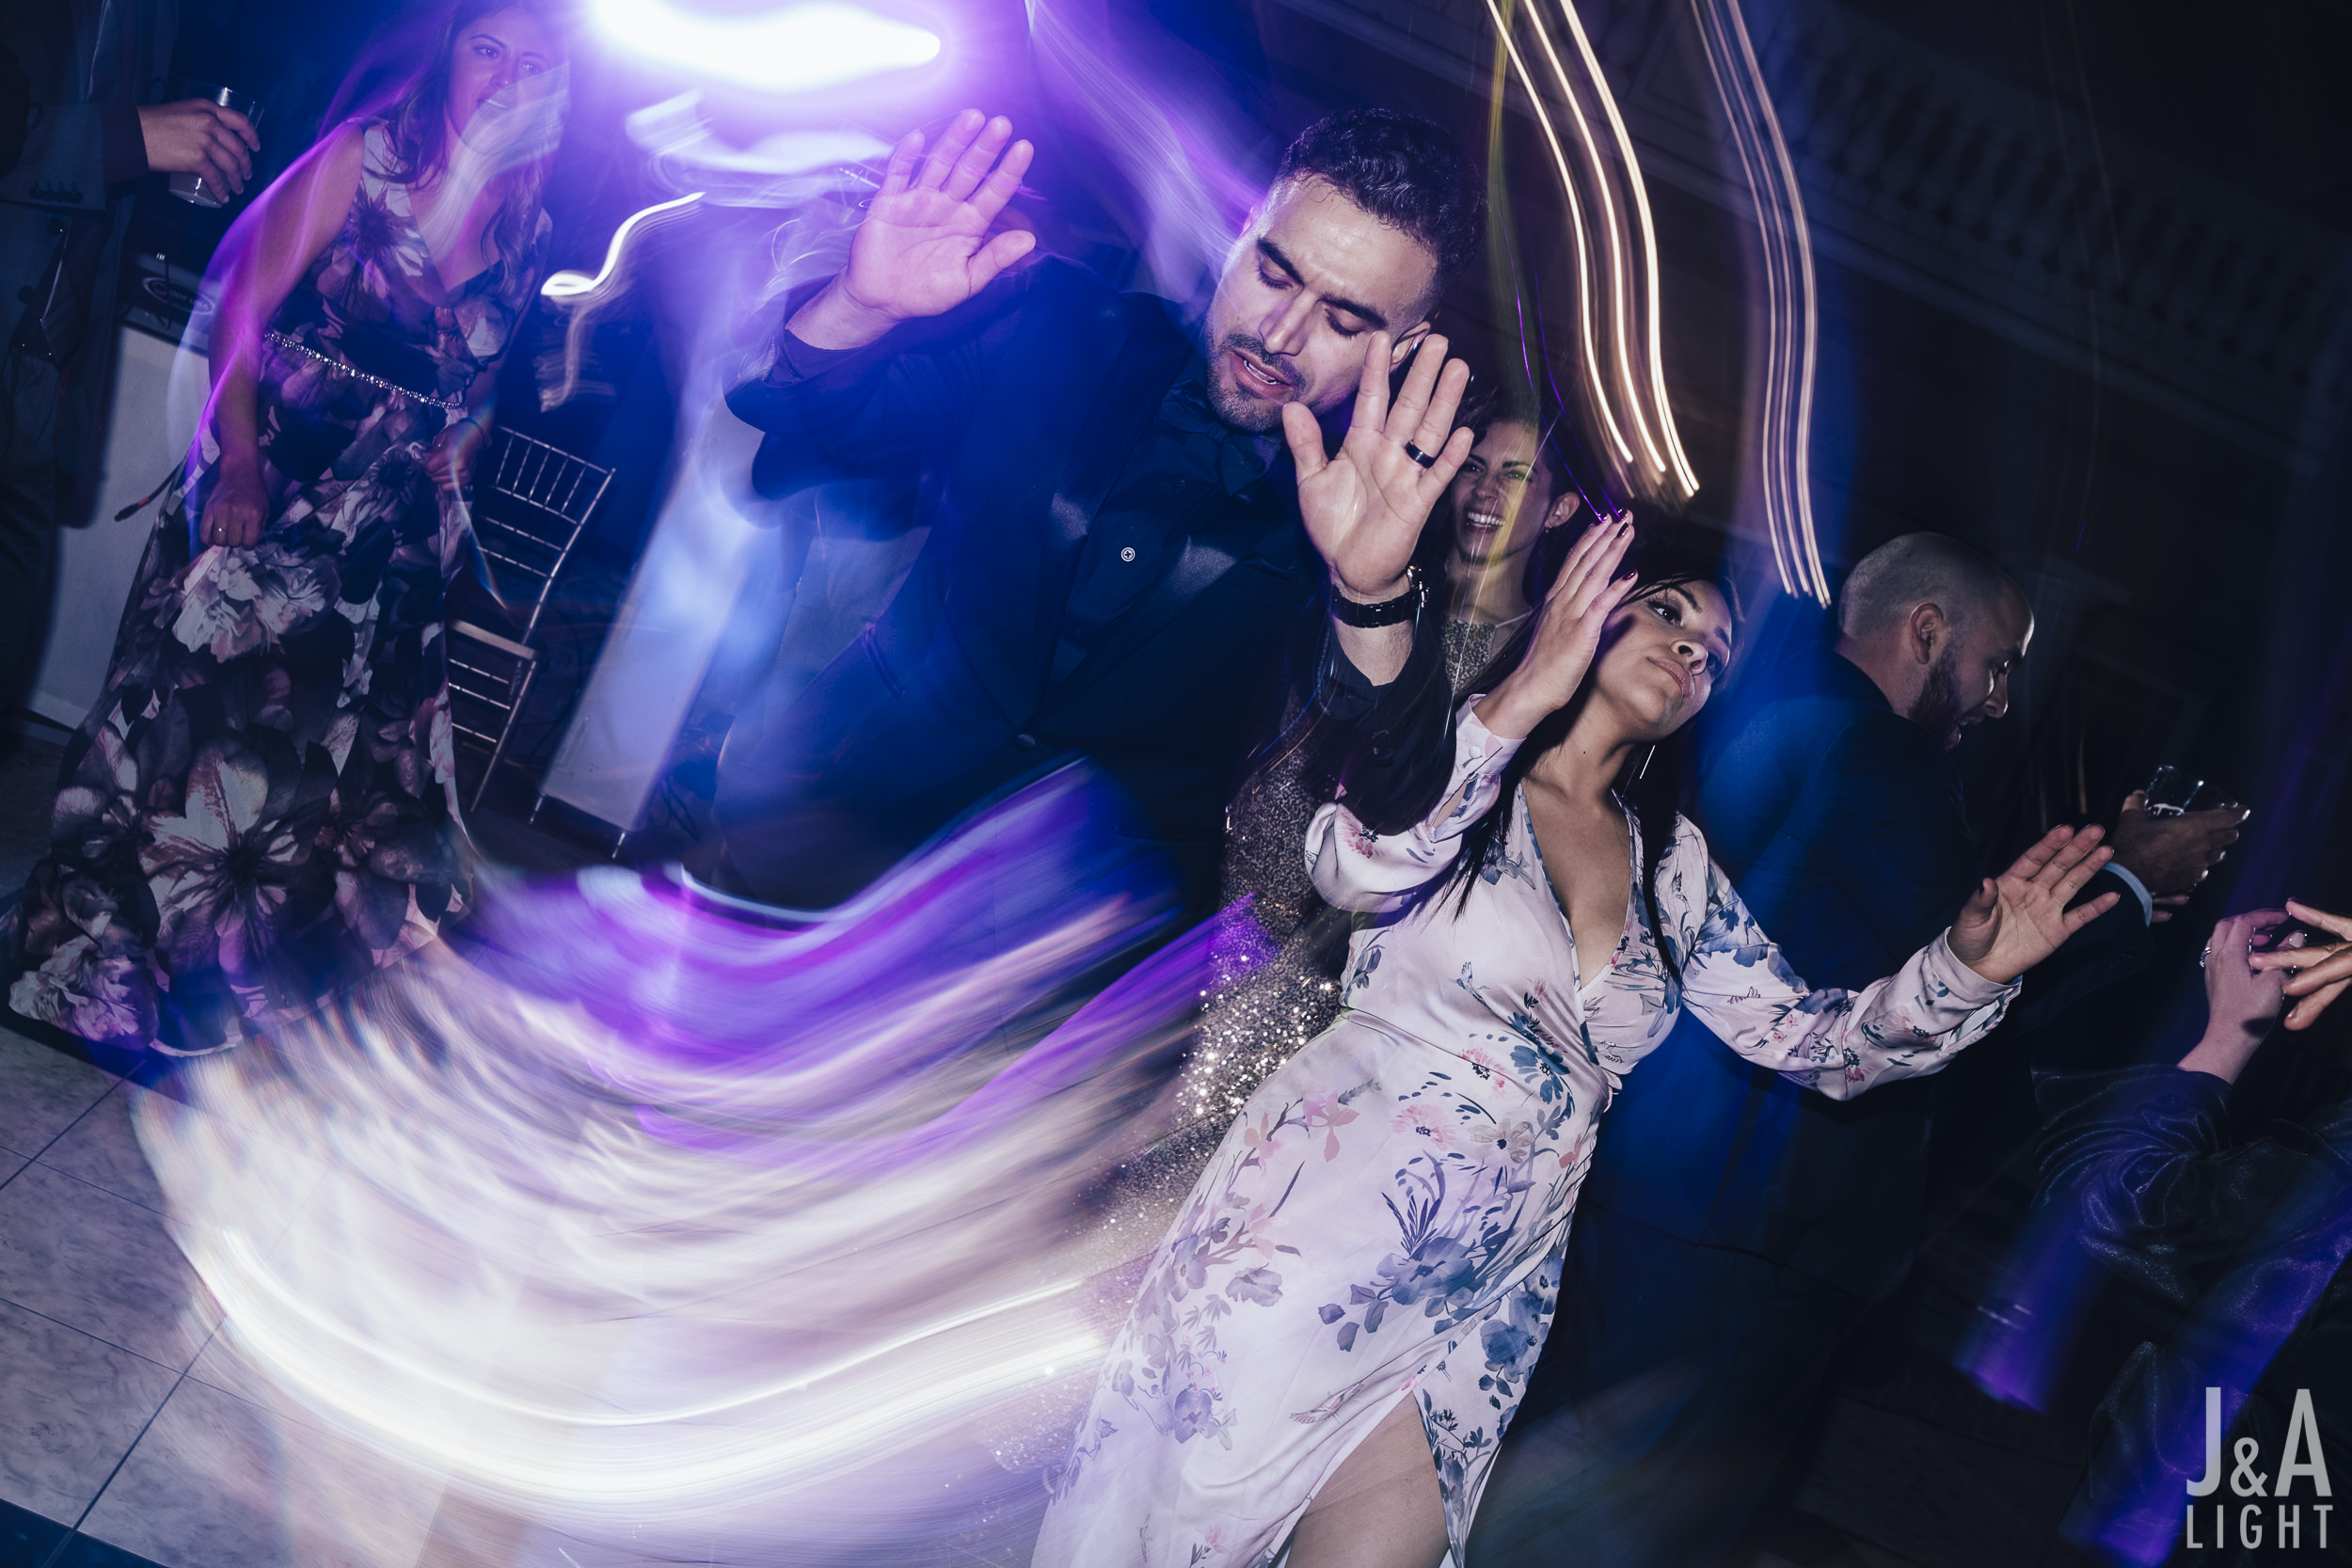 20171014-JanDan-LosBanos-GlassMansion-Wedding-Blog-094.jpg